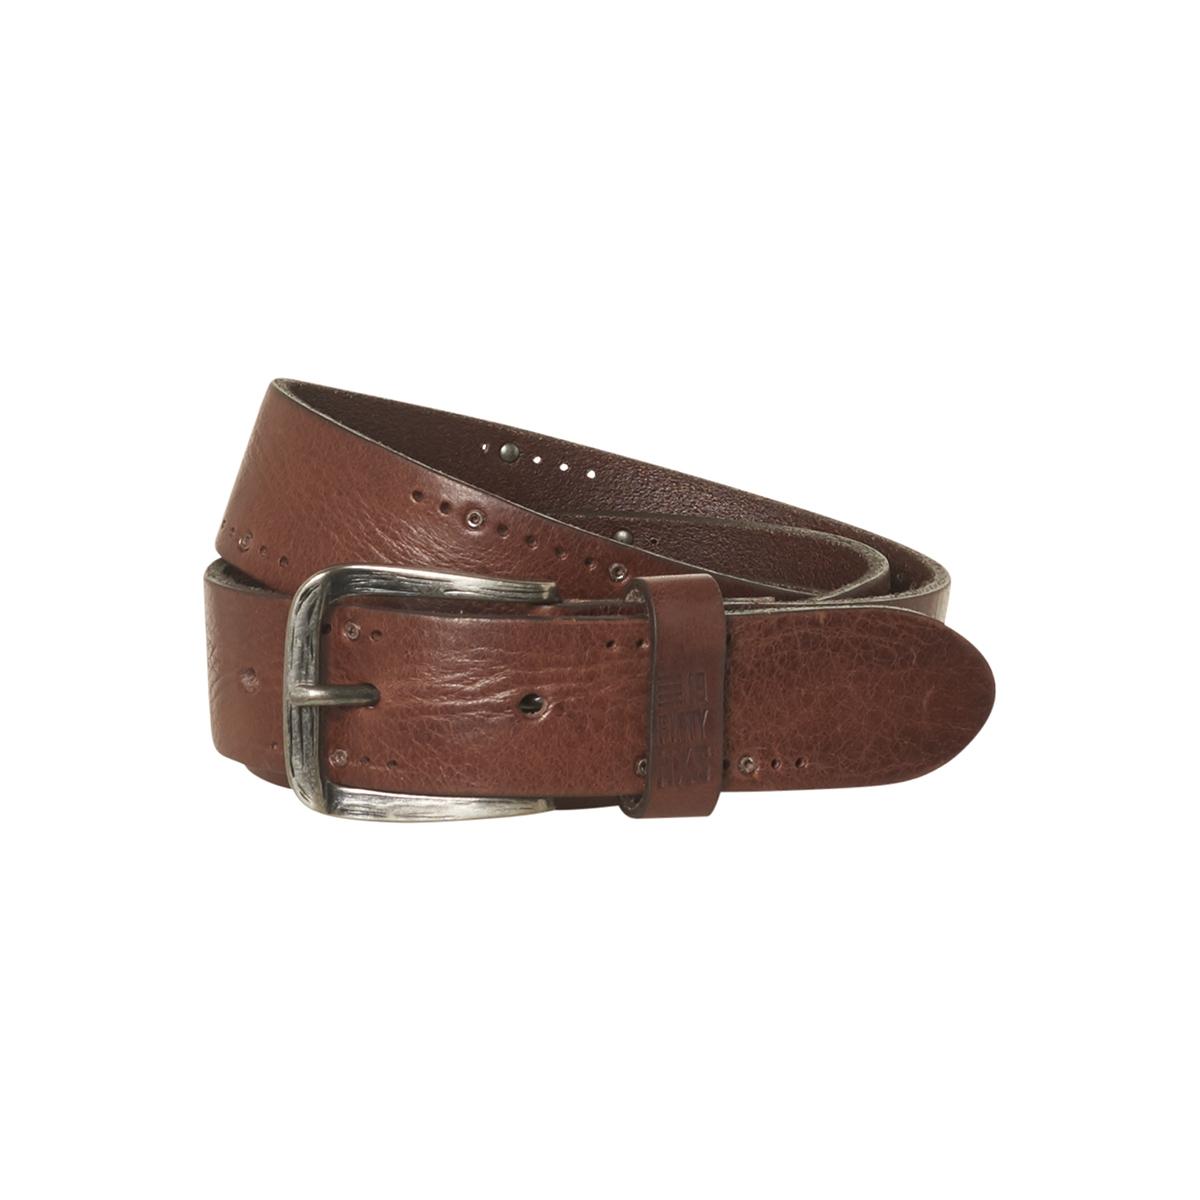 leather belt 92blt50 no-excess riem 042 dk brown